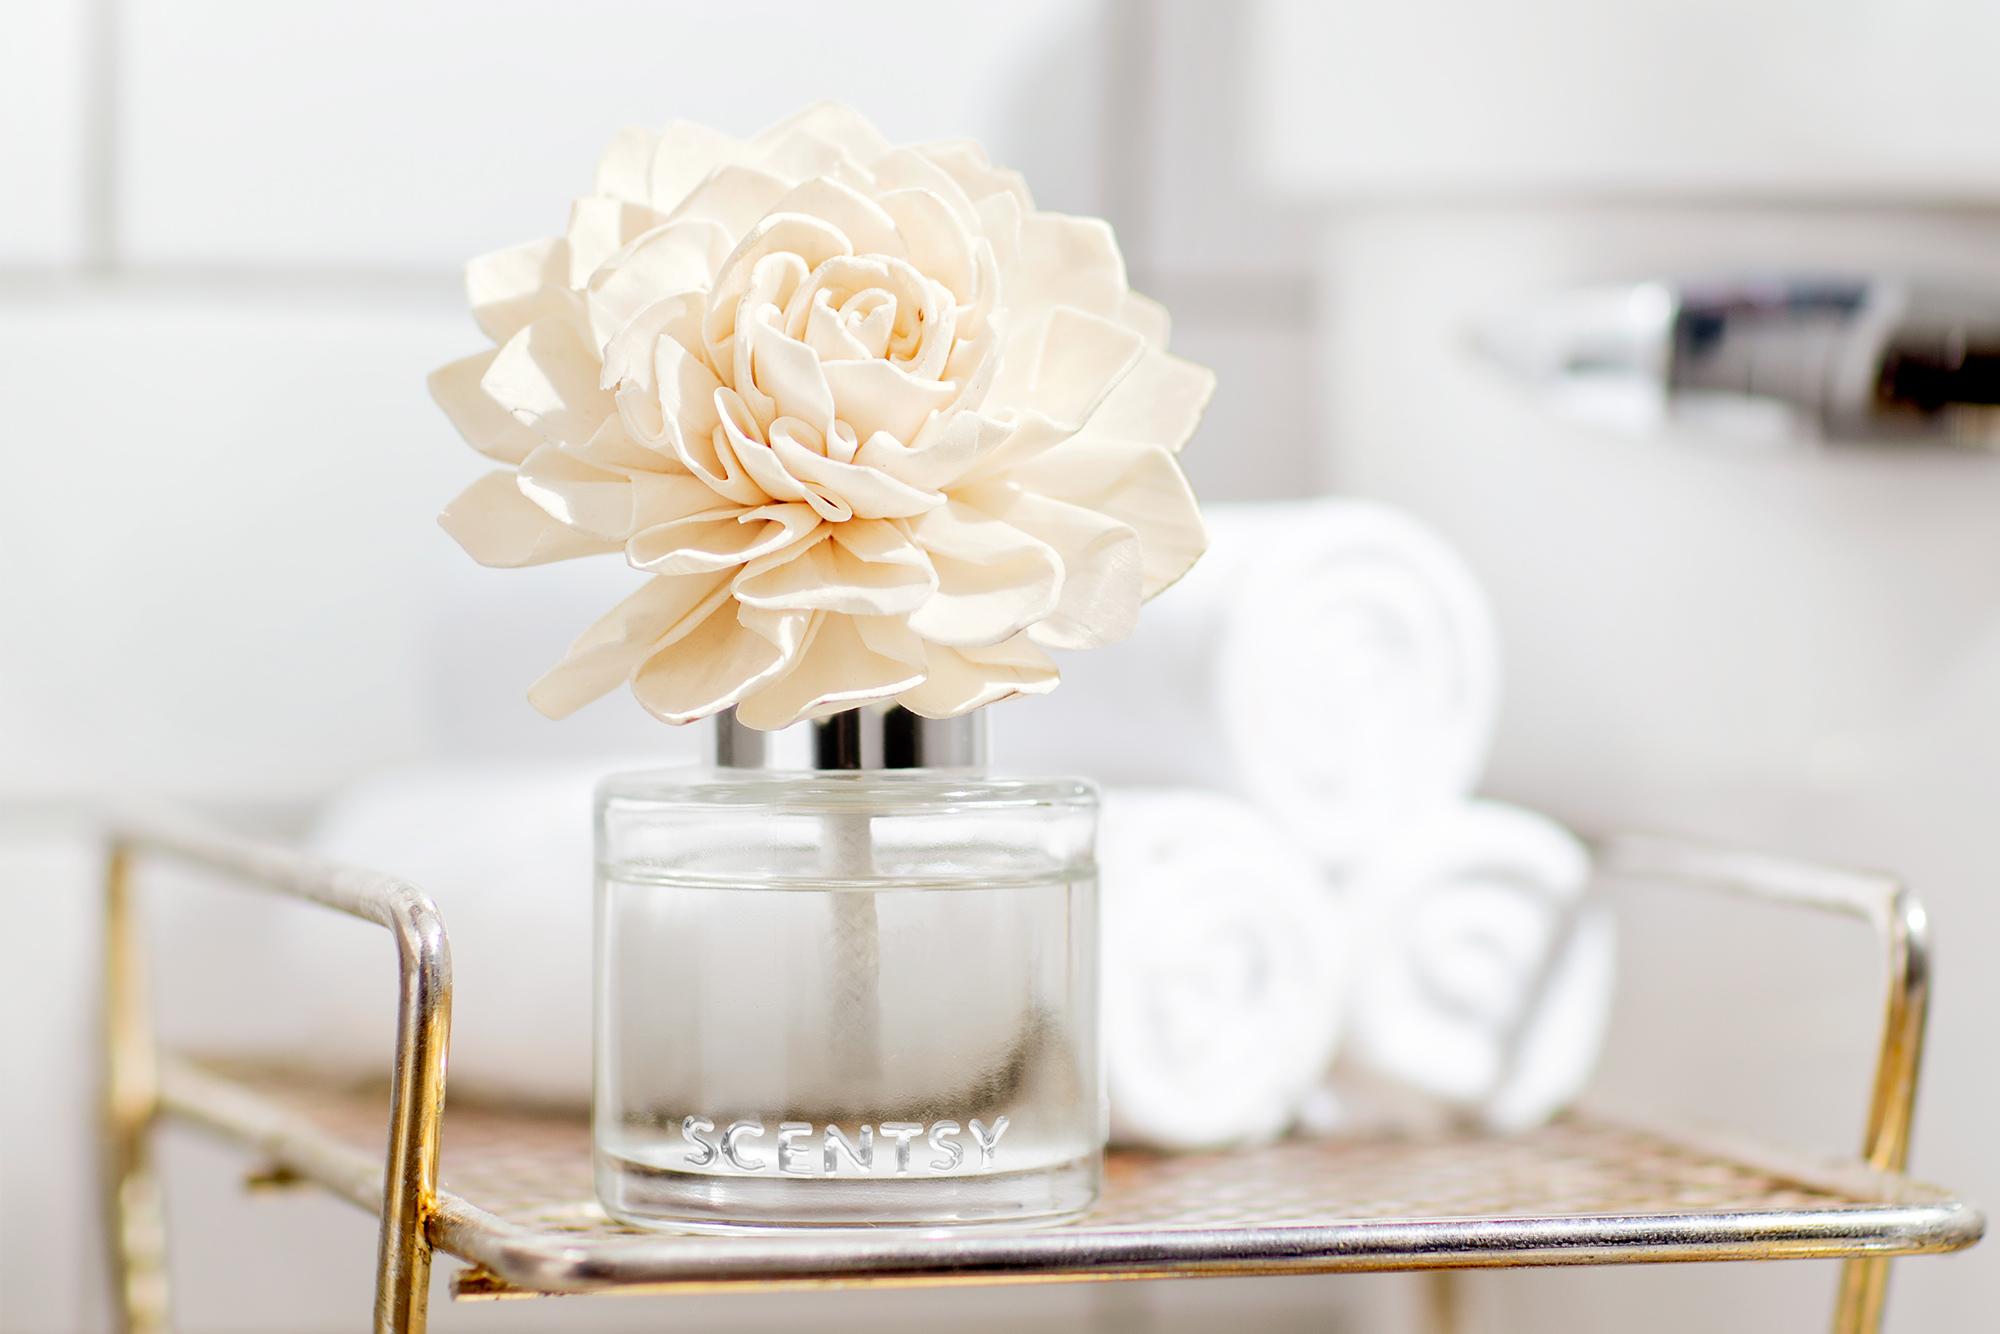 Scentsy Fragrance flower lifestyle photo